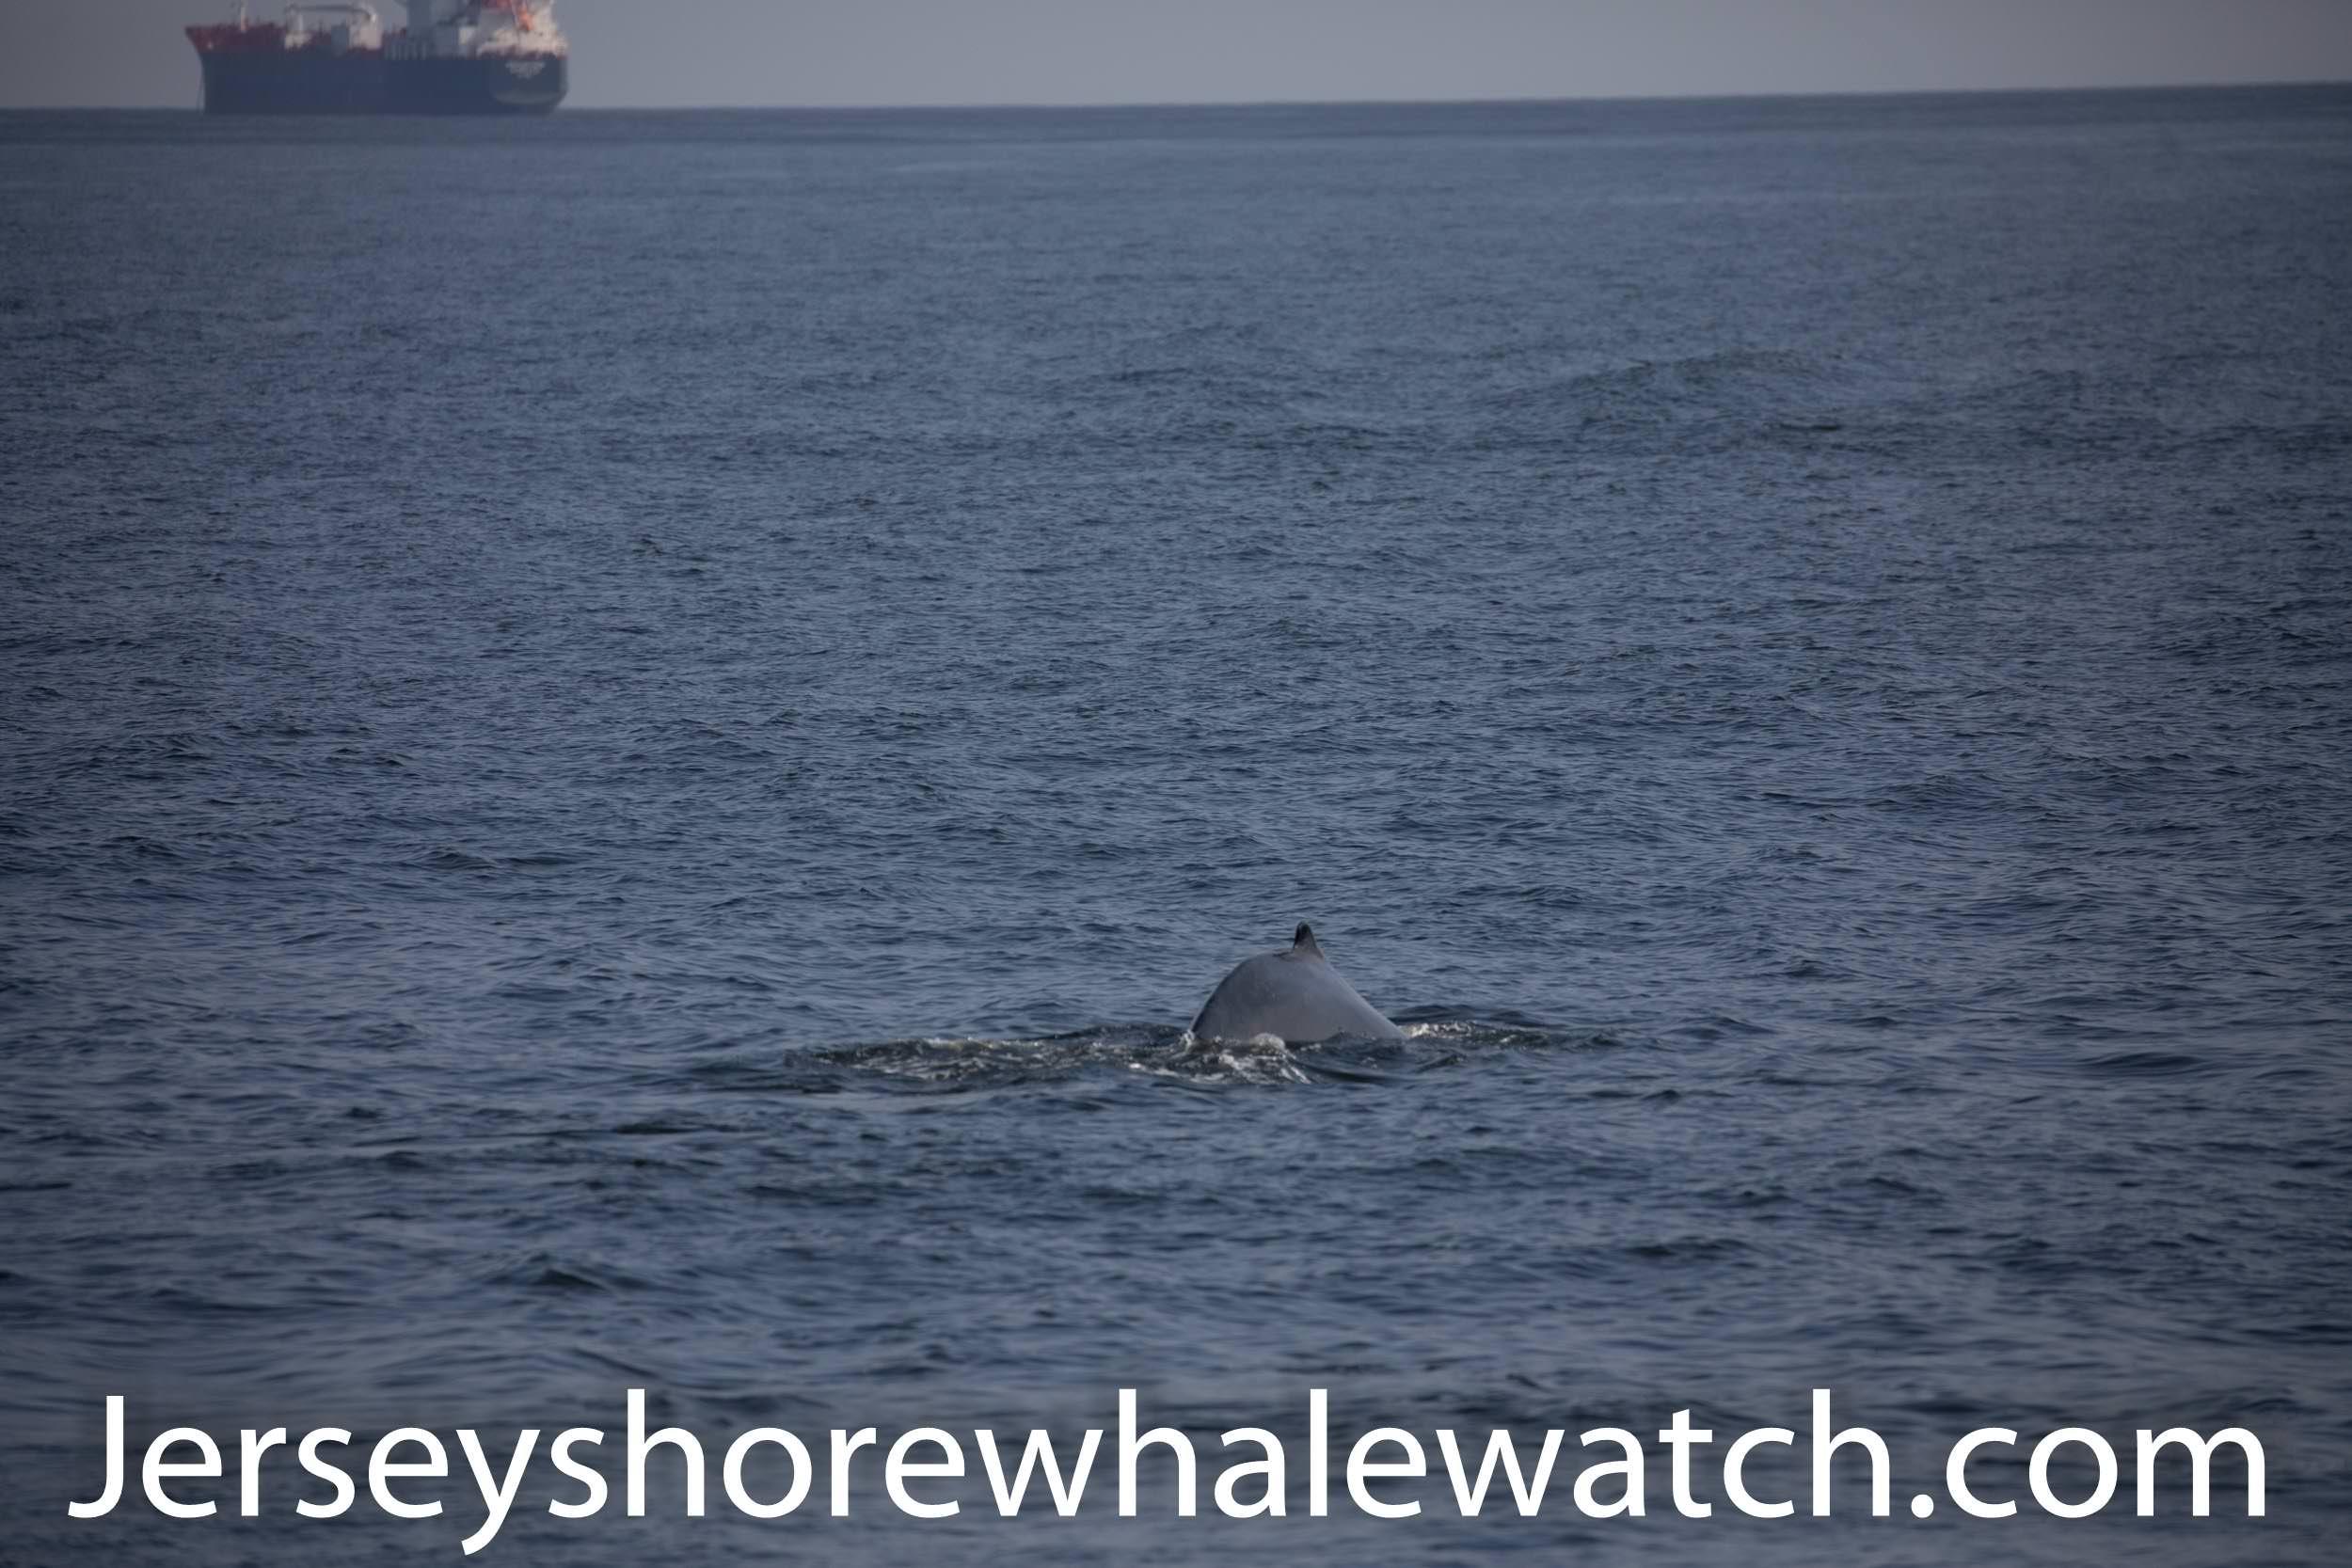 , Whale watching report Aug 28th Belmar Sandy Hook, Jersey Shore Whale Watch Tour 2020 Season